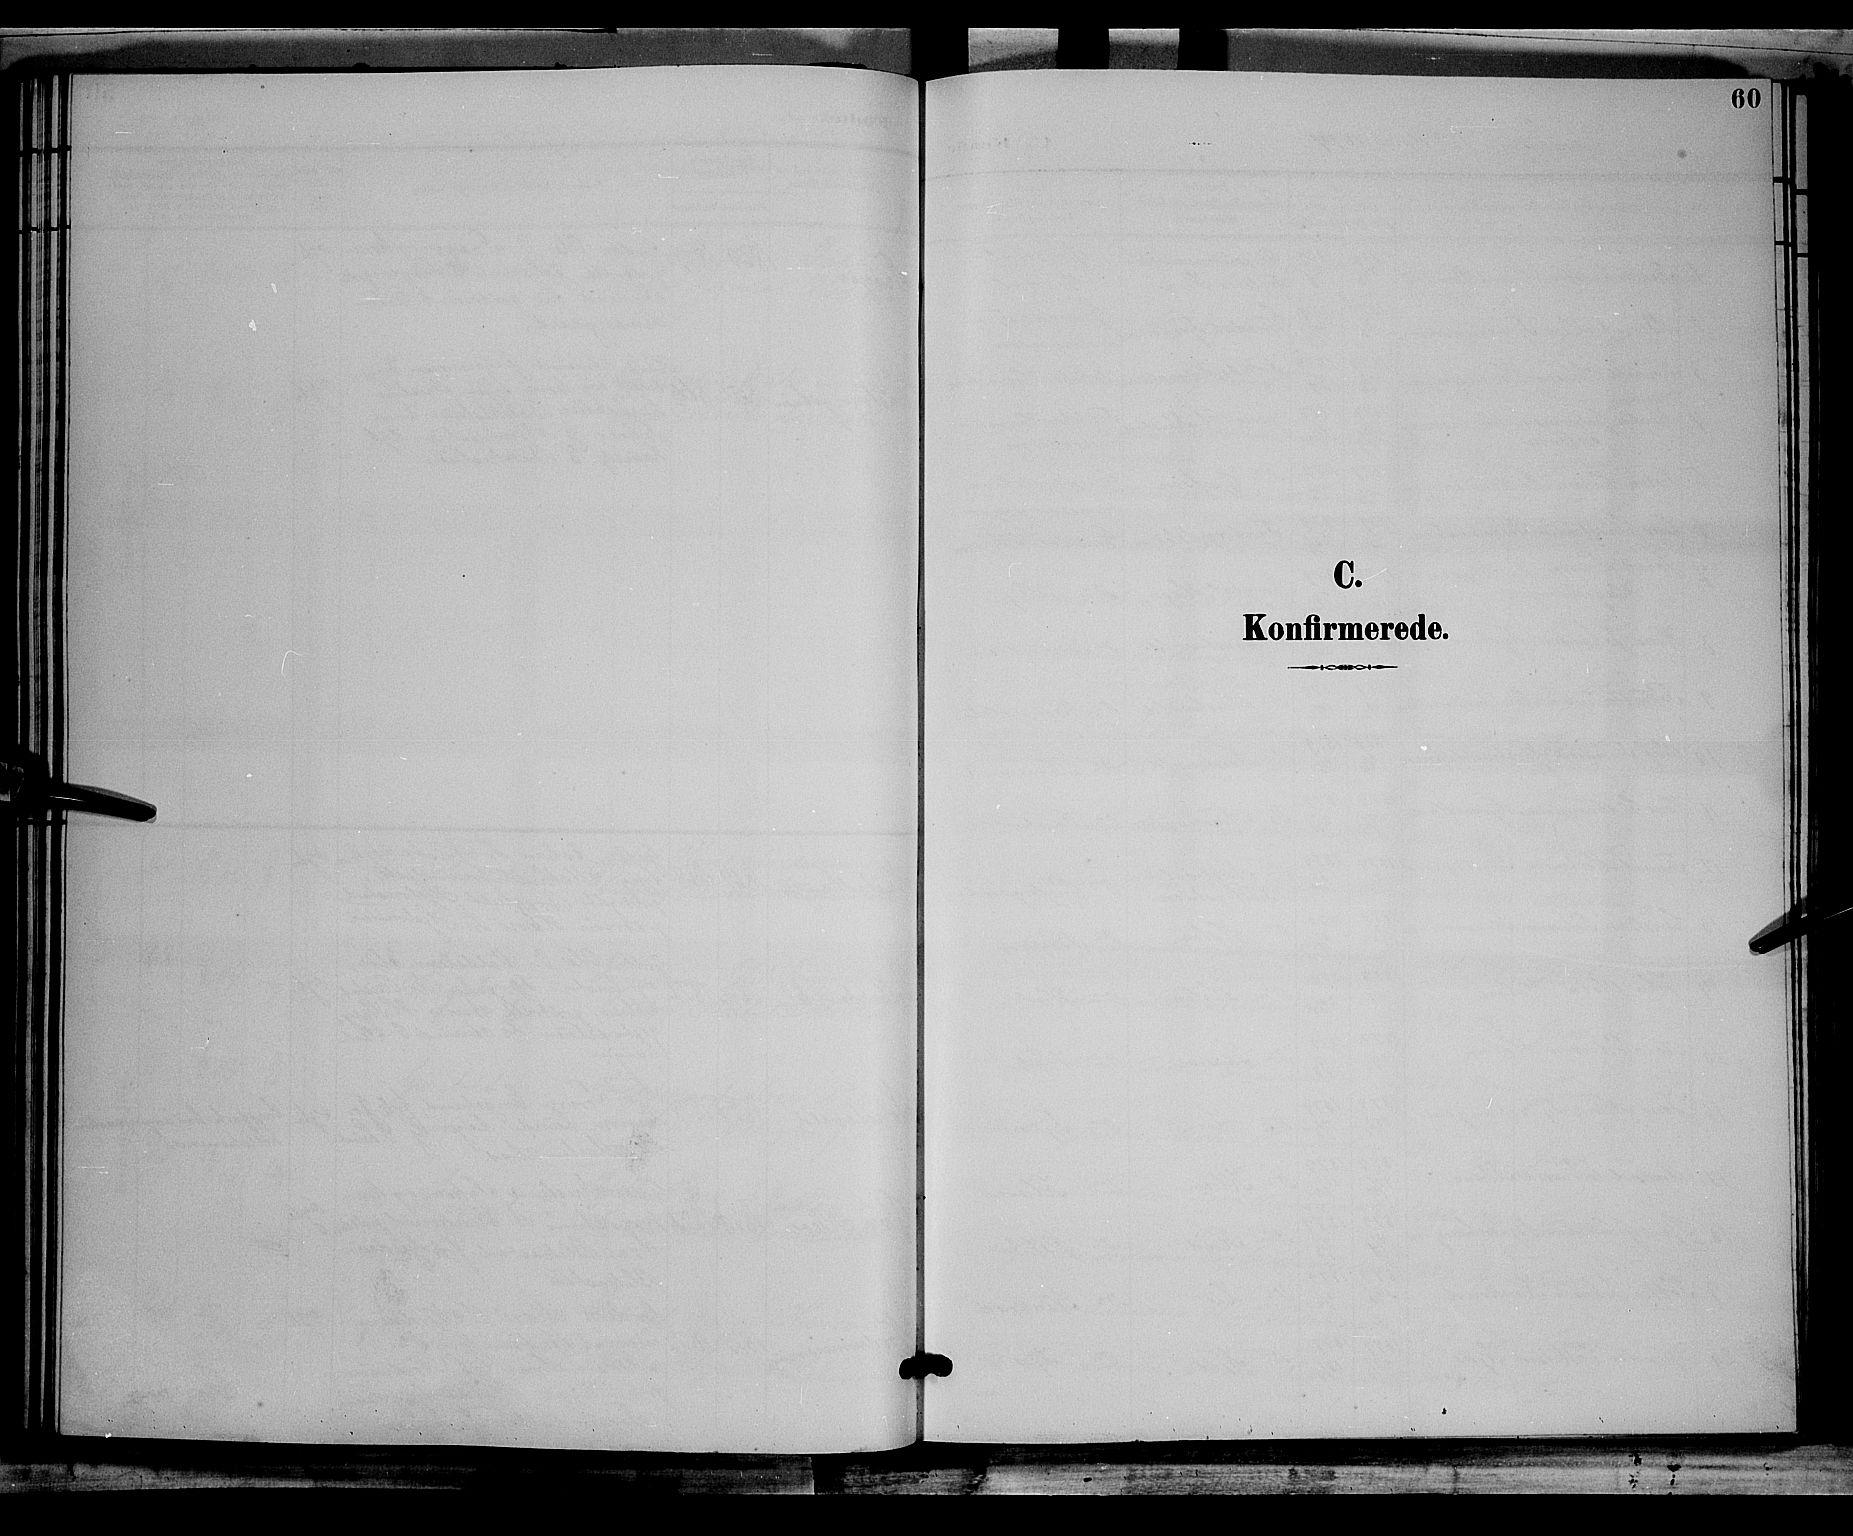 SAH, Østre Gausdal prestekontor, Klokkerbok nr. 2, 1894-1904, s. 60